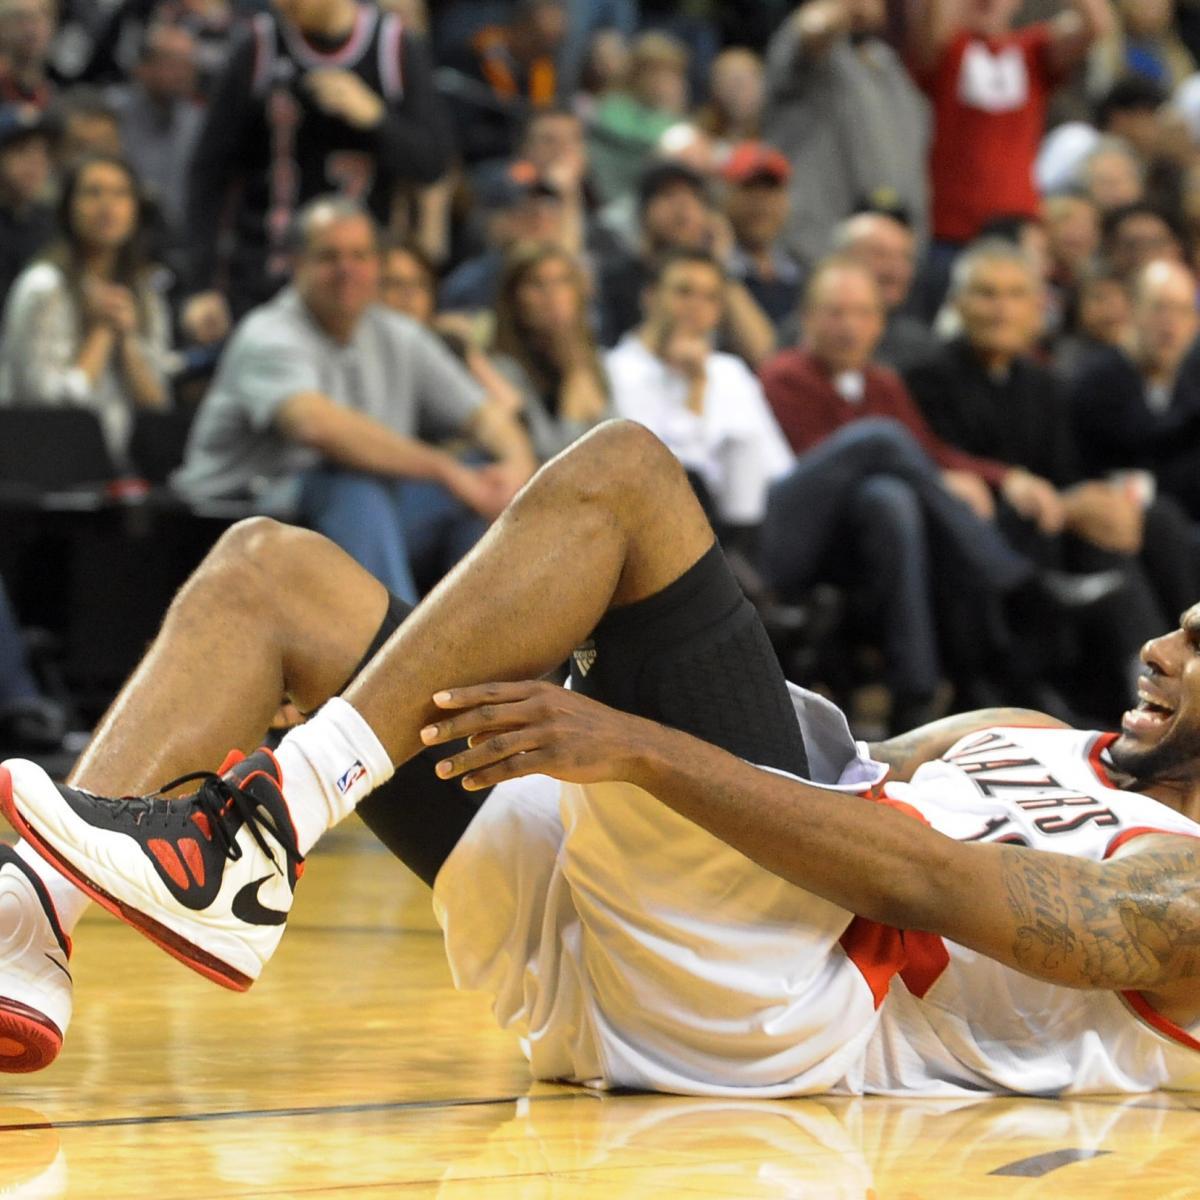 Portland Trail Blazers Injury News: LaMarcus Aldridge: Updates On Trail Blazers Forward's